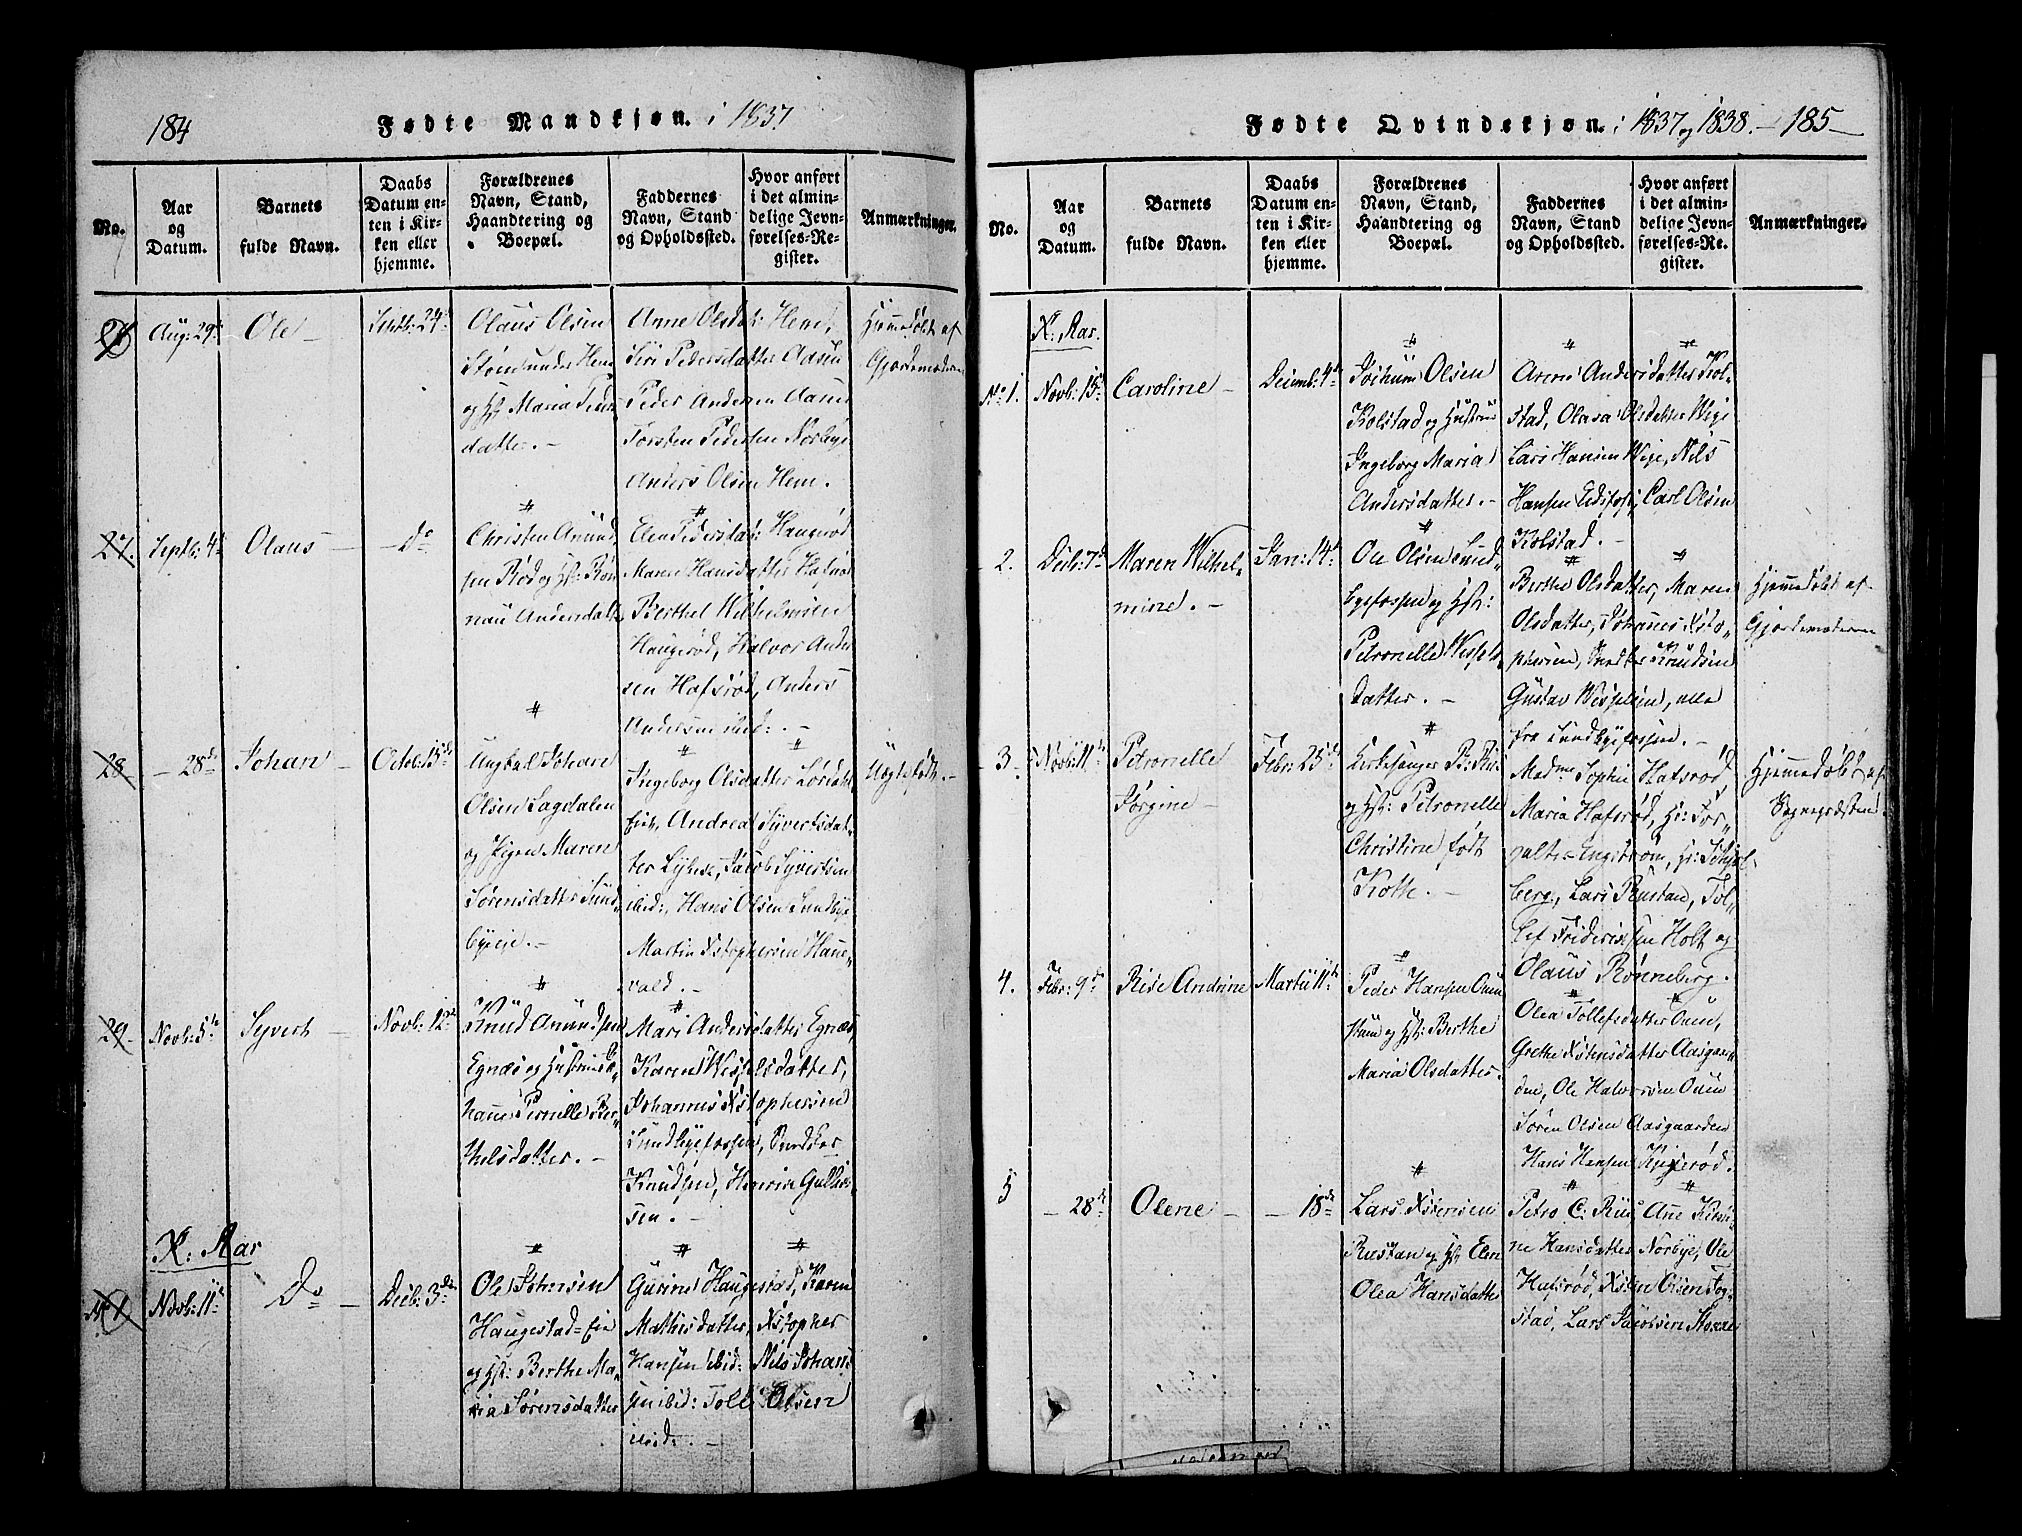 SAKO, Hof kirkebøker, F/Fa/L0004: Ministerialbok nr. I 4, 1814-1843, s. 184-185